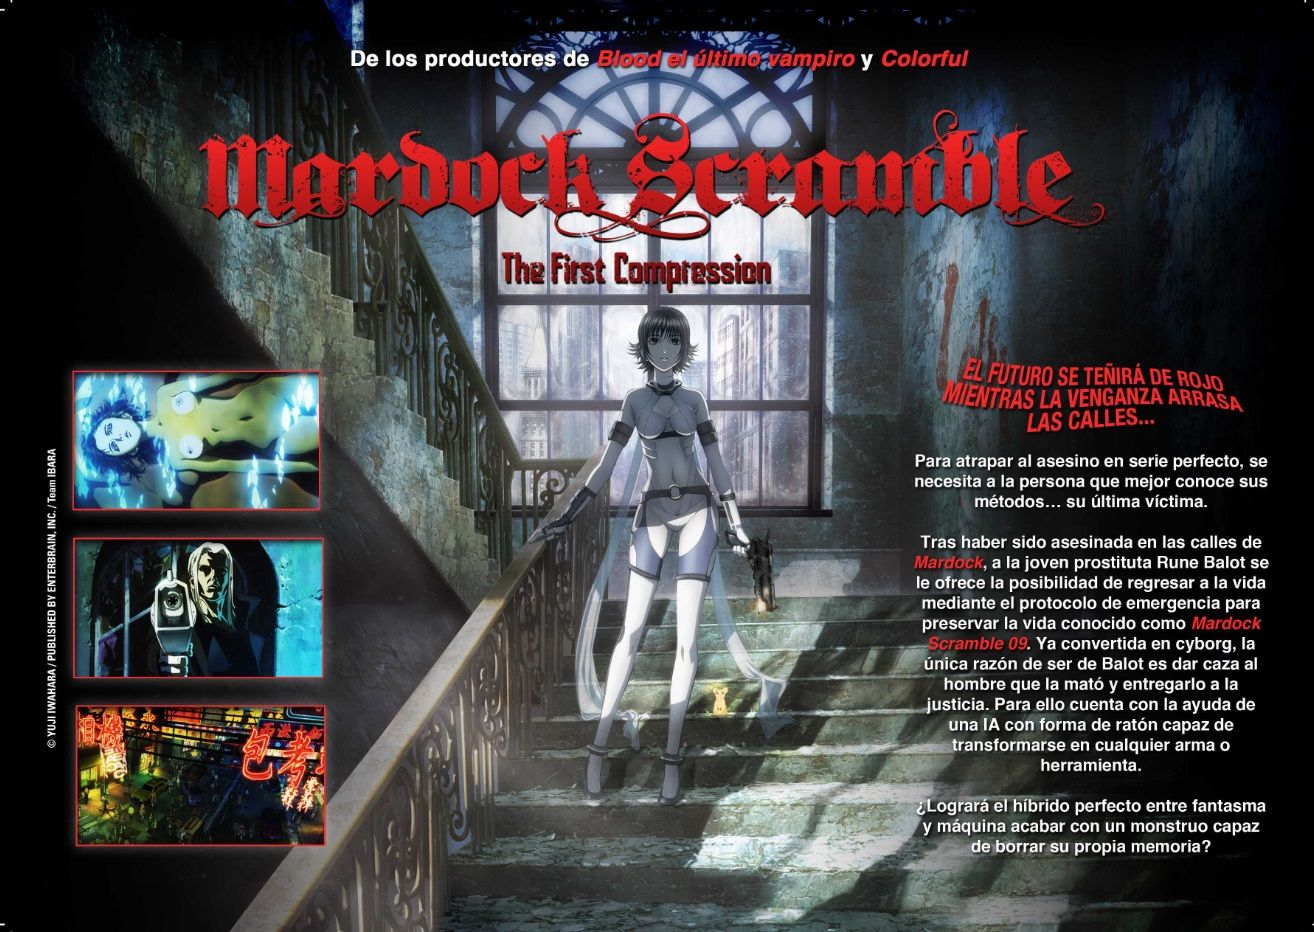 Mardock_Scramble_2